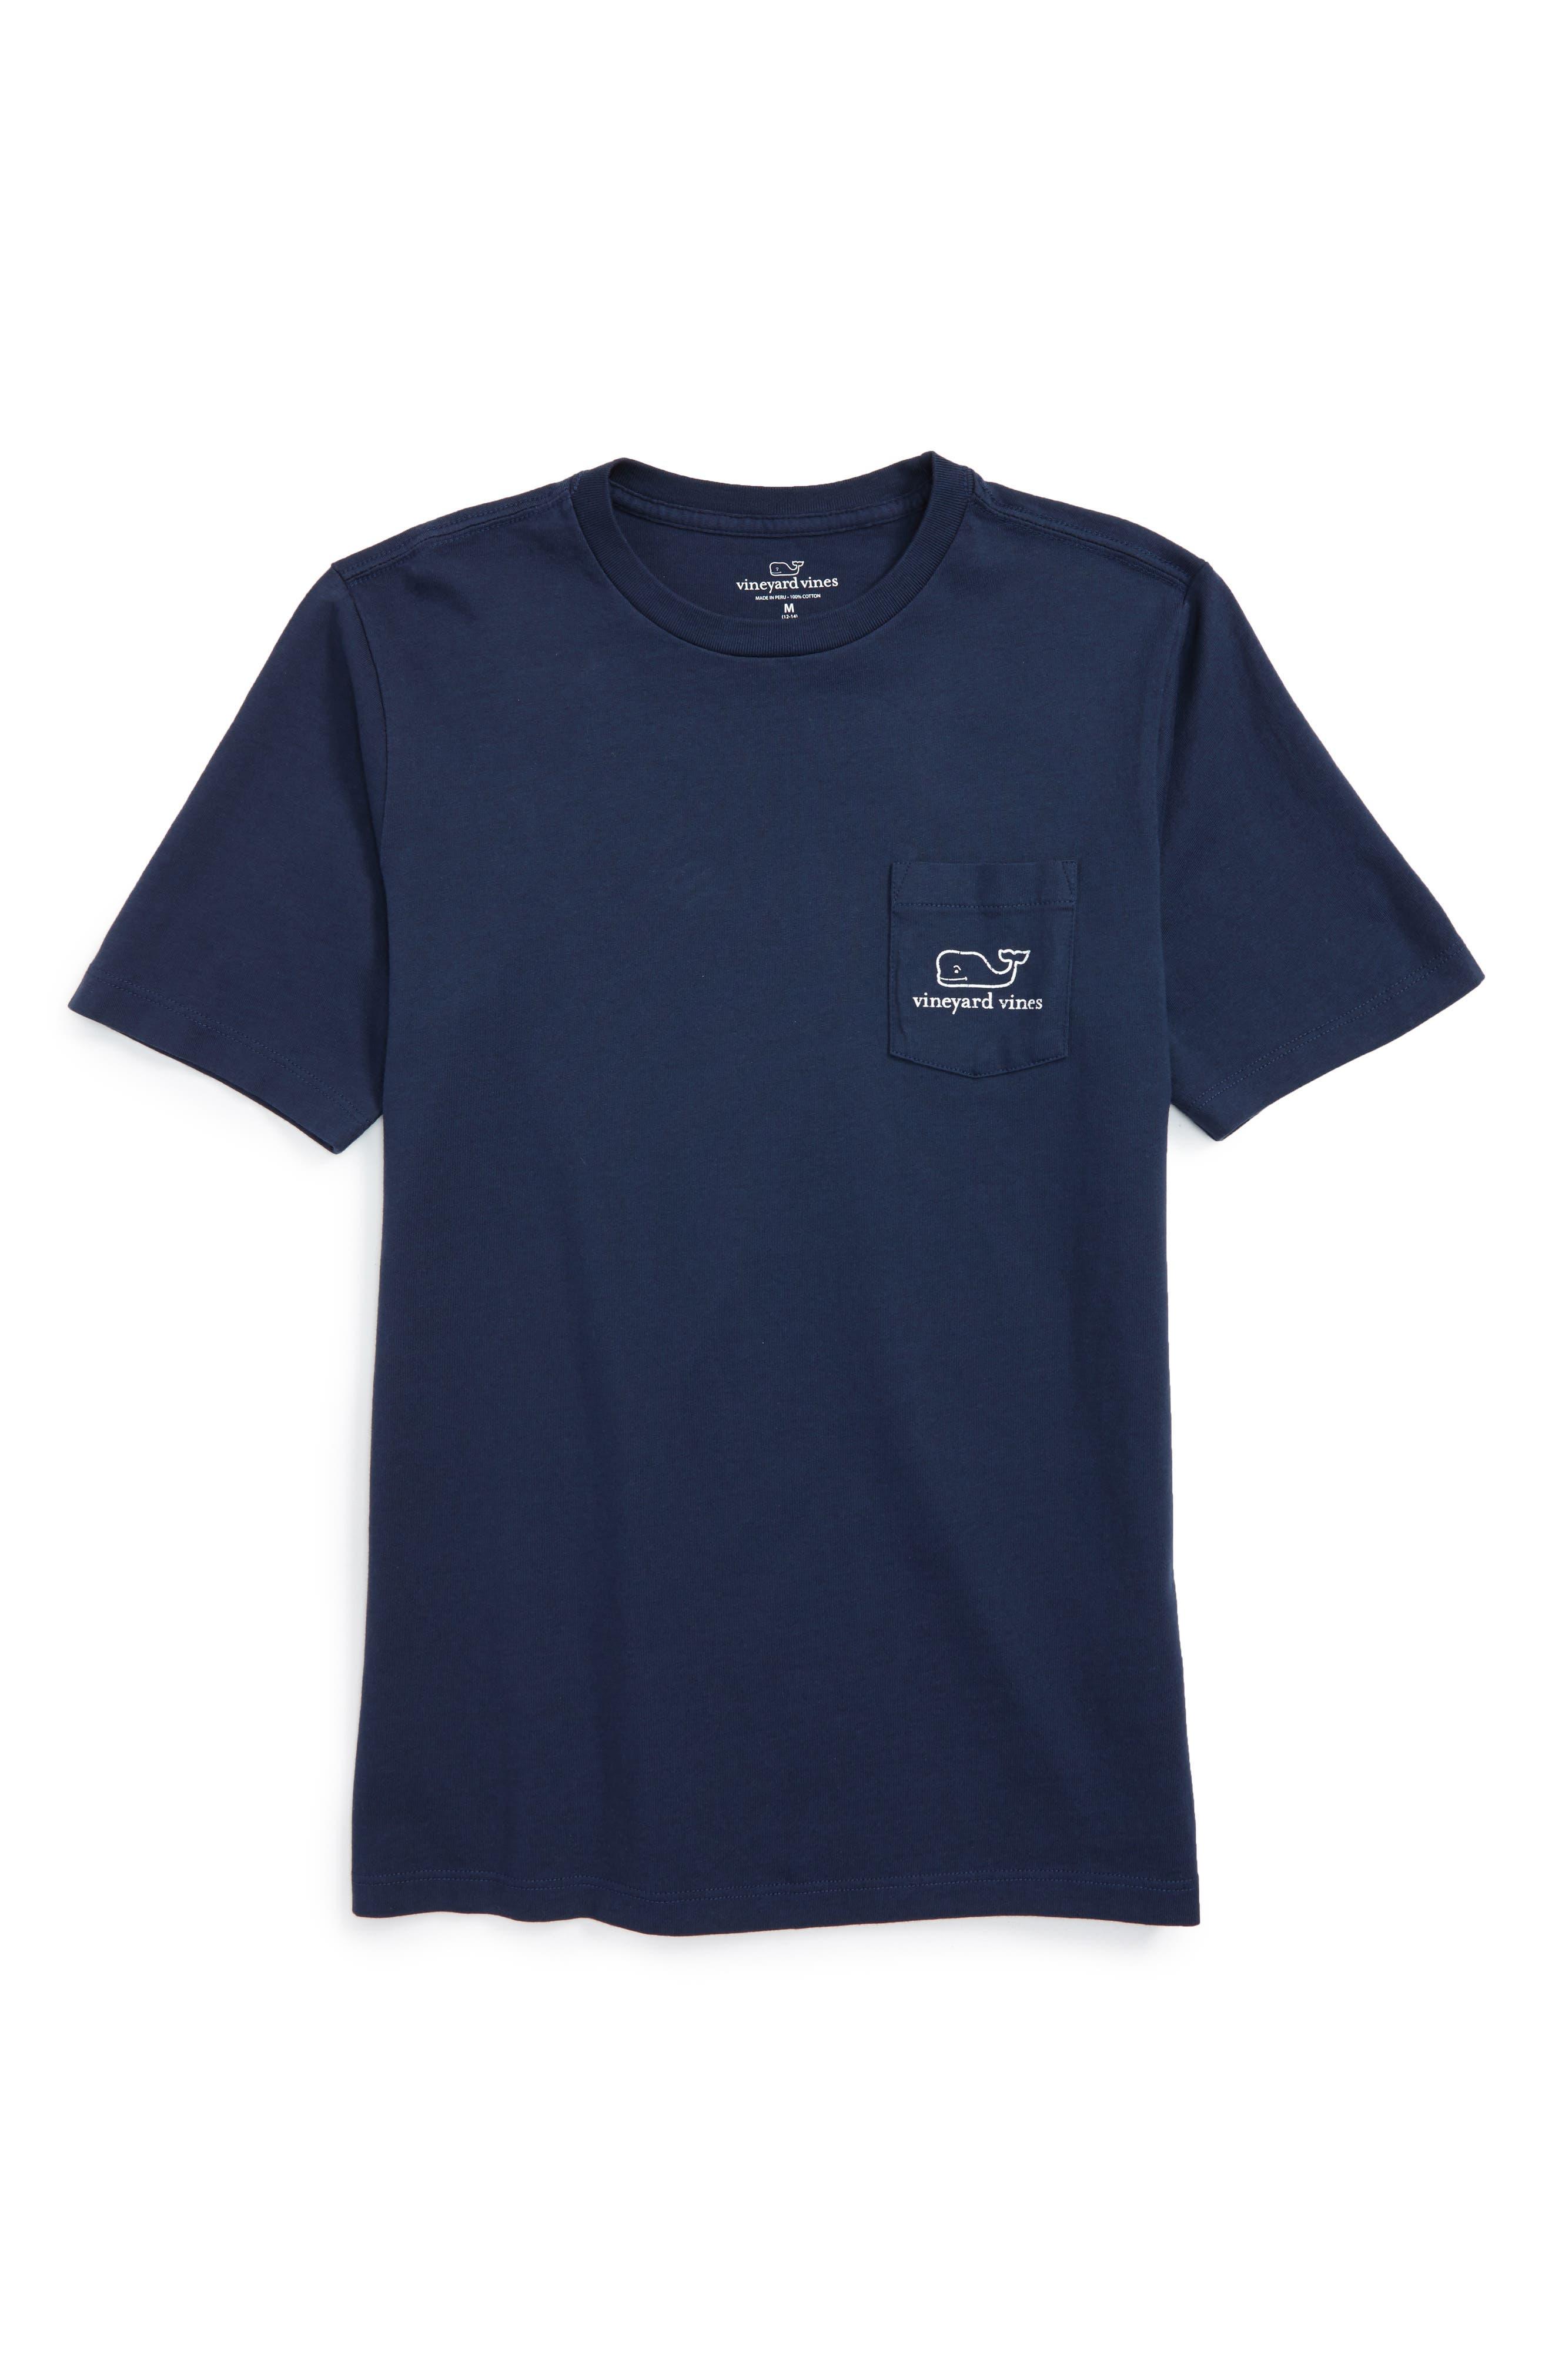 vineyard vines Vintage Whale Pocket T-Shirt (Toddler Boys & Little Boys)